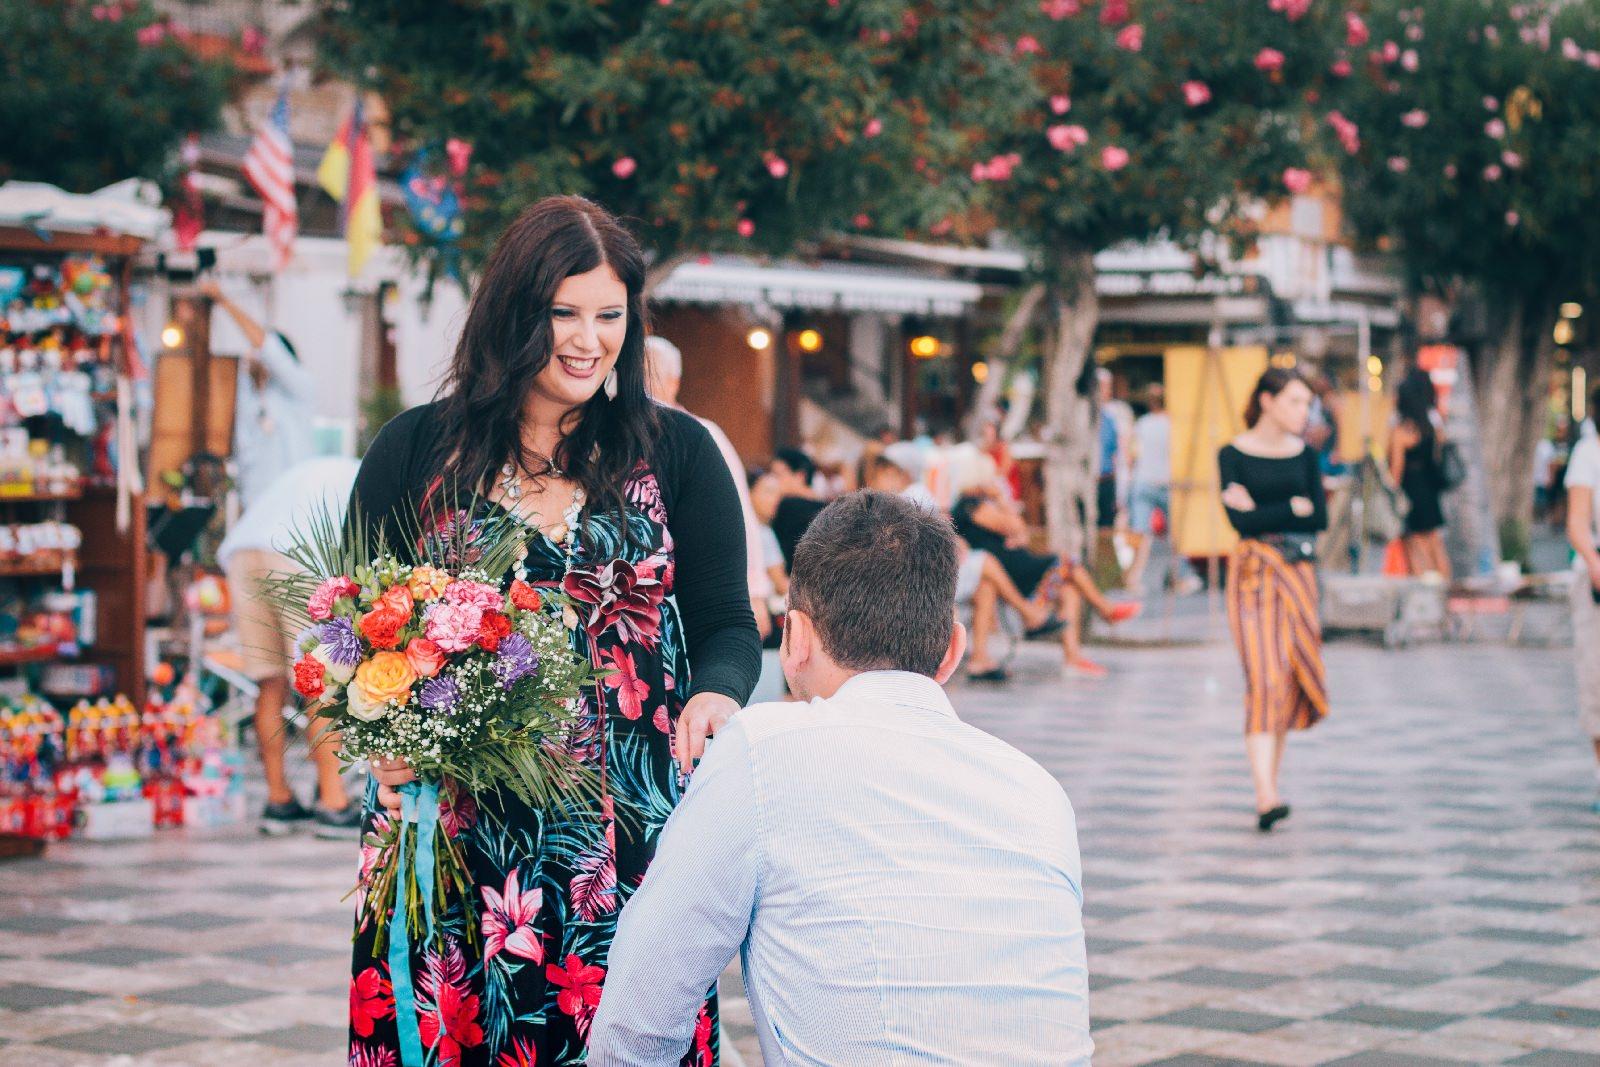 058-2018-09-22-Engagement-Alessandra-e-Igor-Pizzone-058